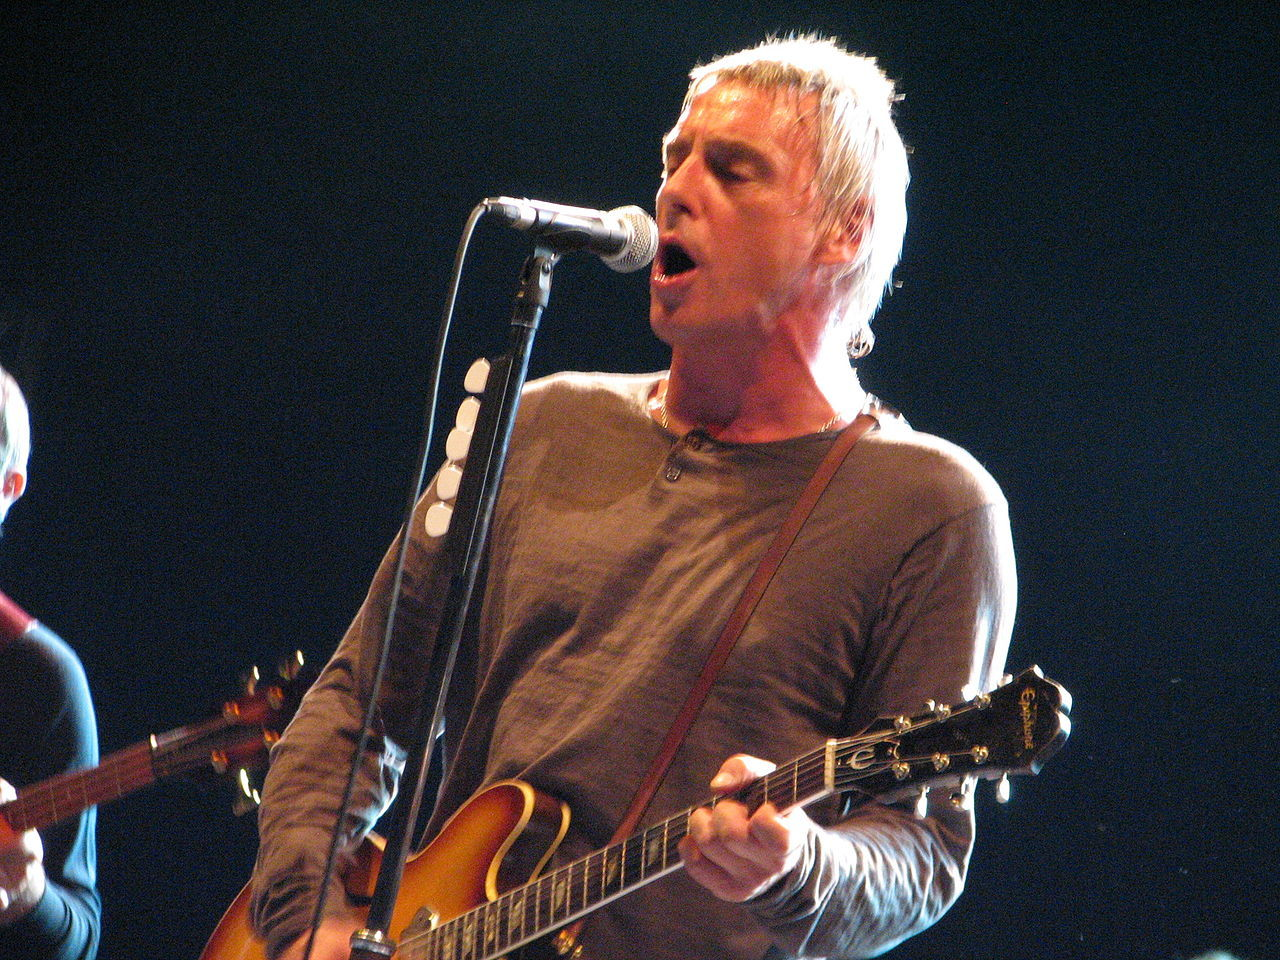 Paul Weller (Foto: maccosta / http://www.flickr.com/photos/maccosta/3712596892/sizes/o/ )